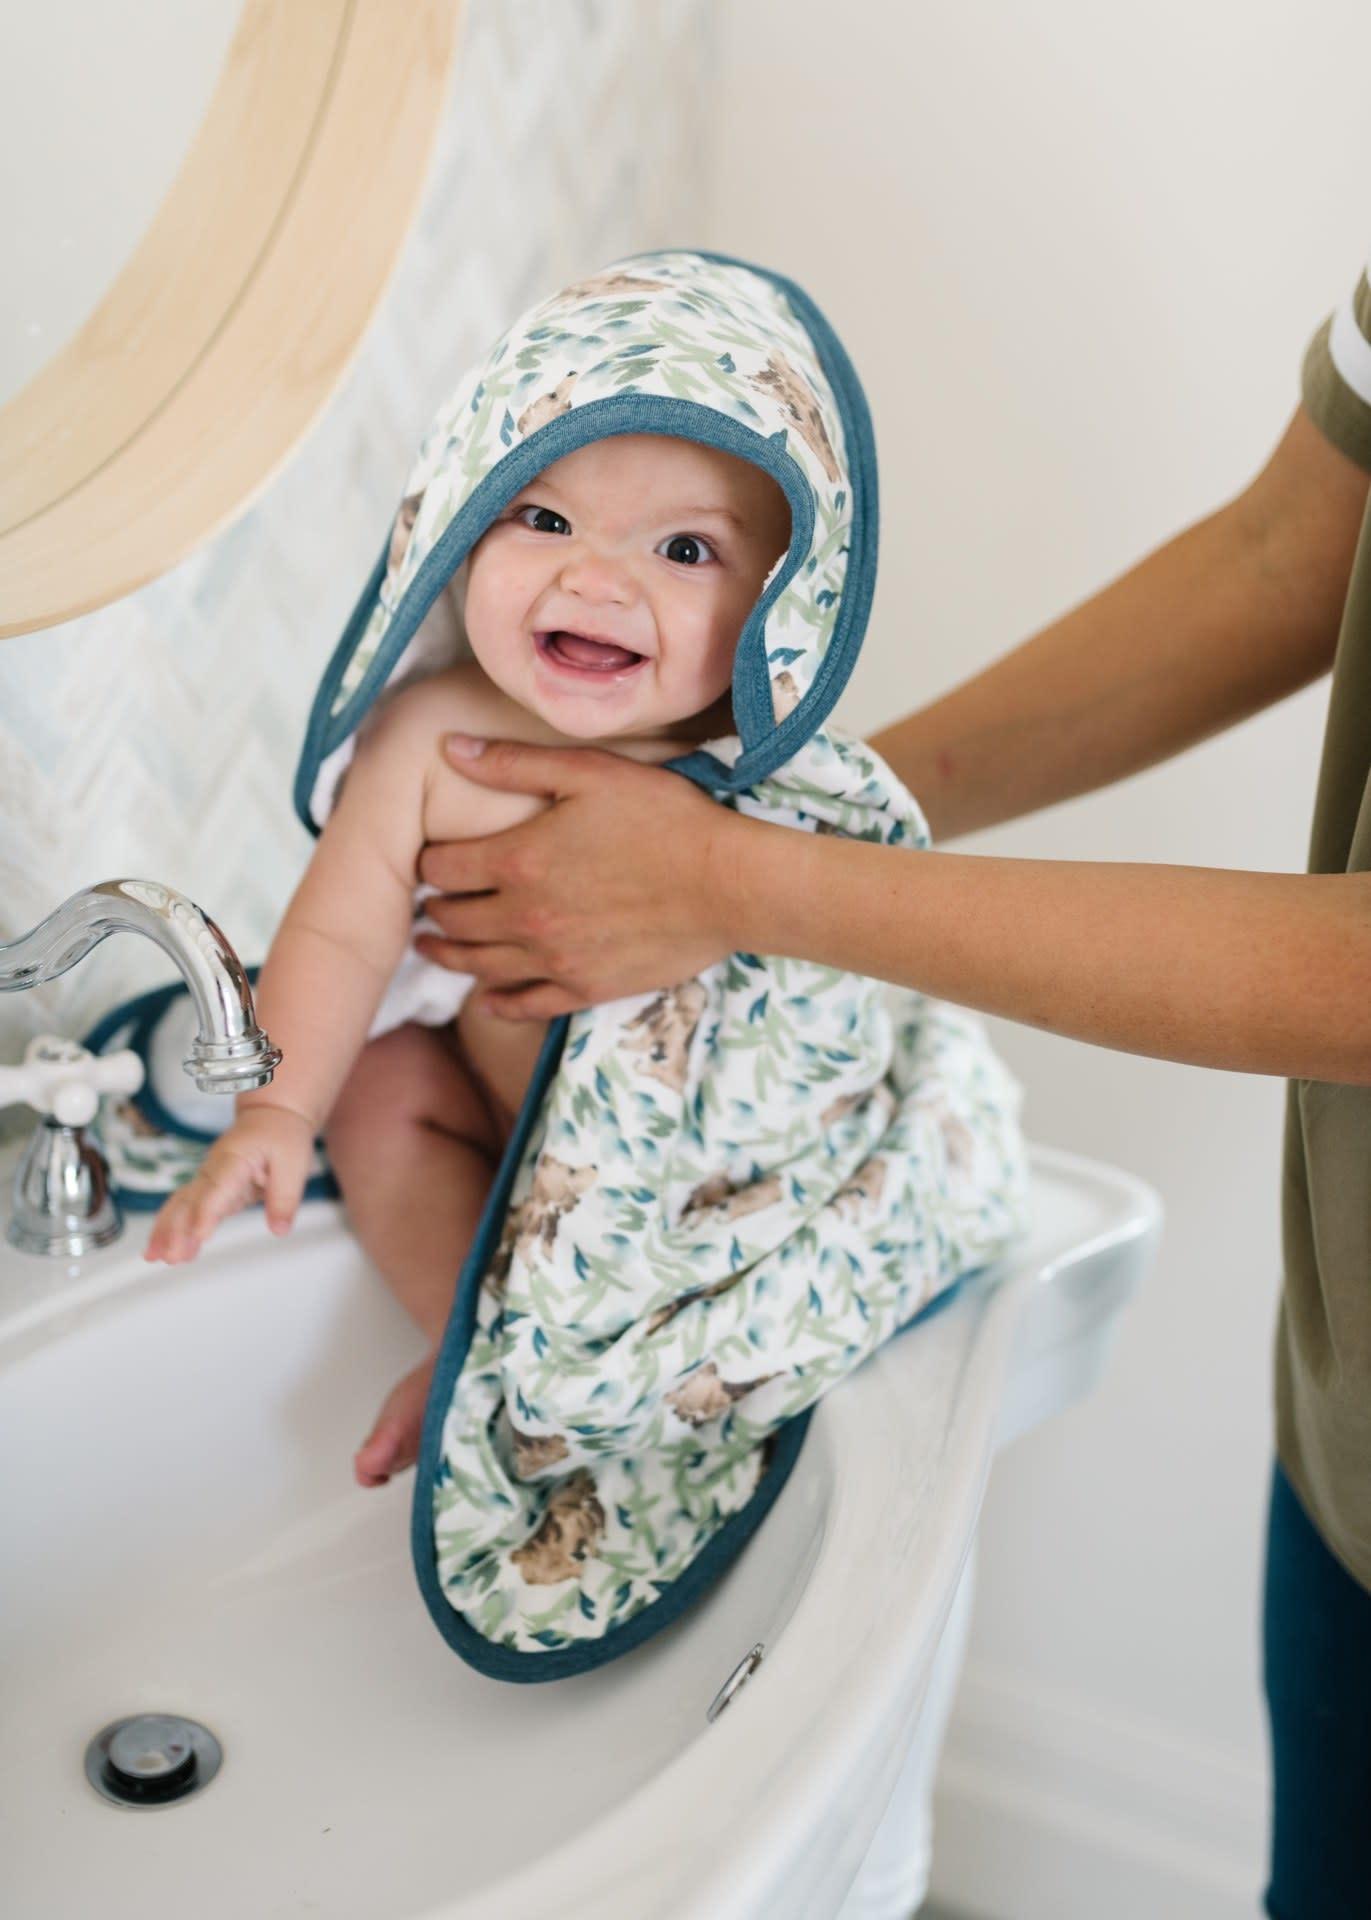 Copper Pearl Knit Hooded Towel - Bear